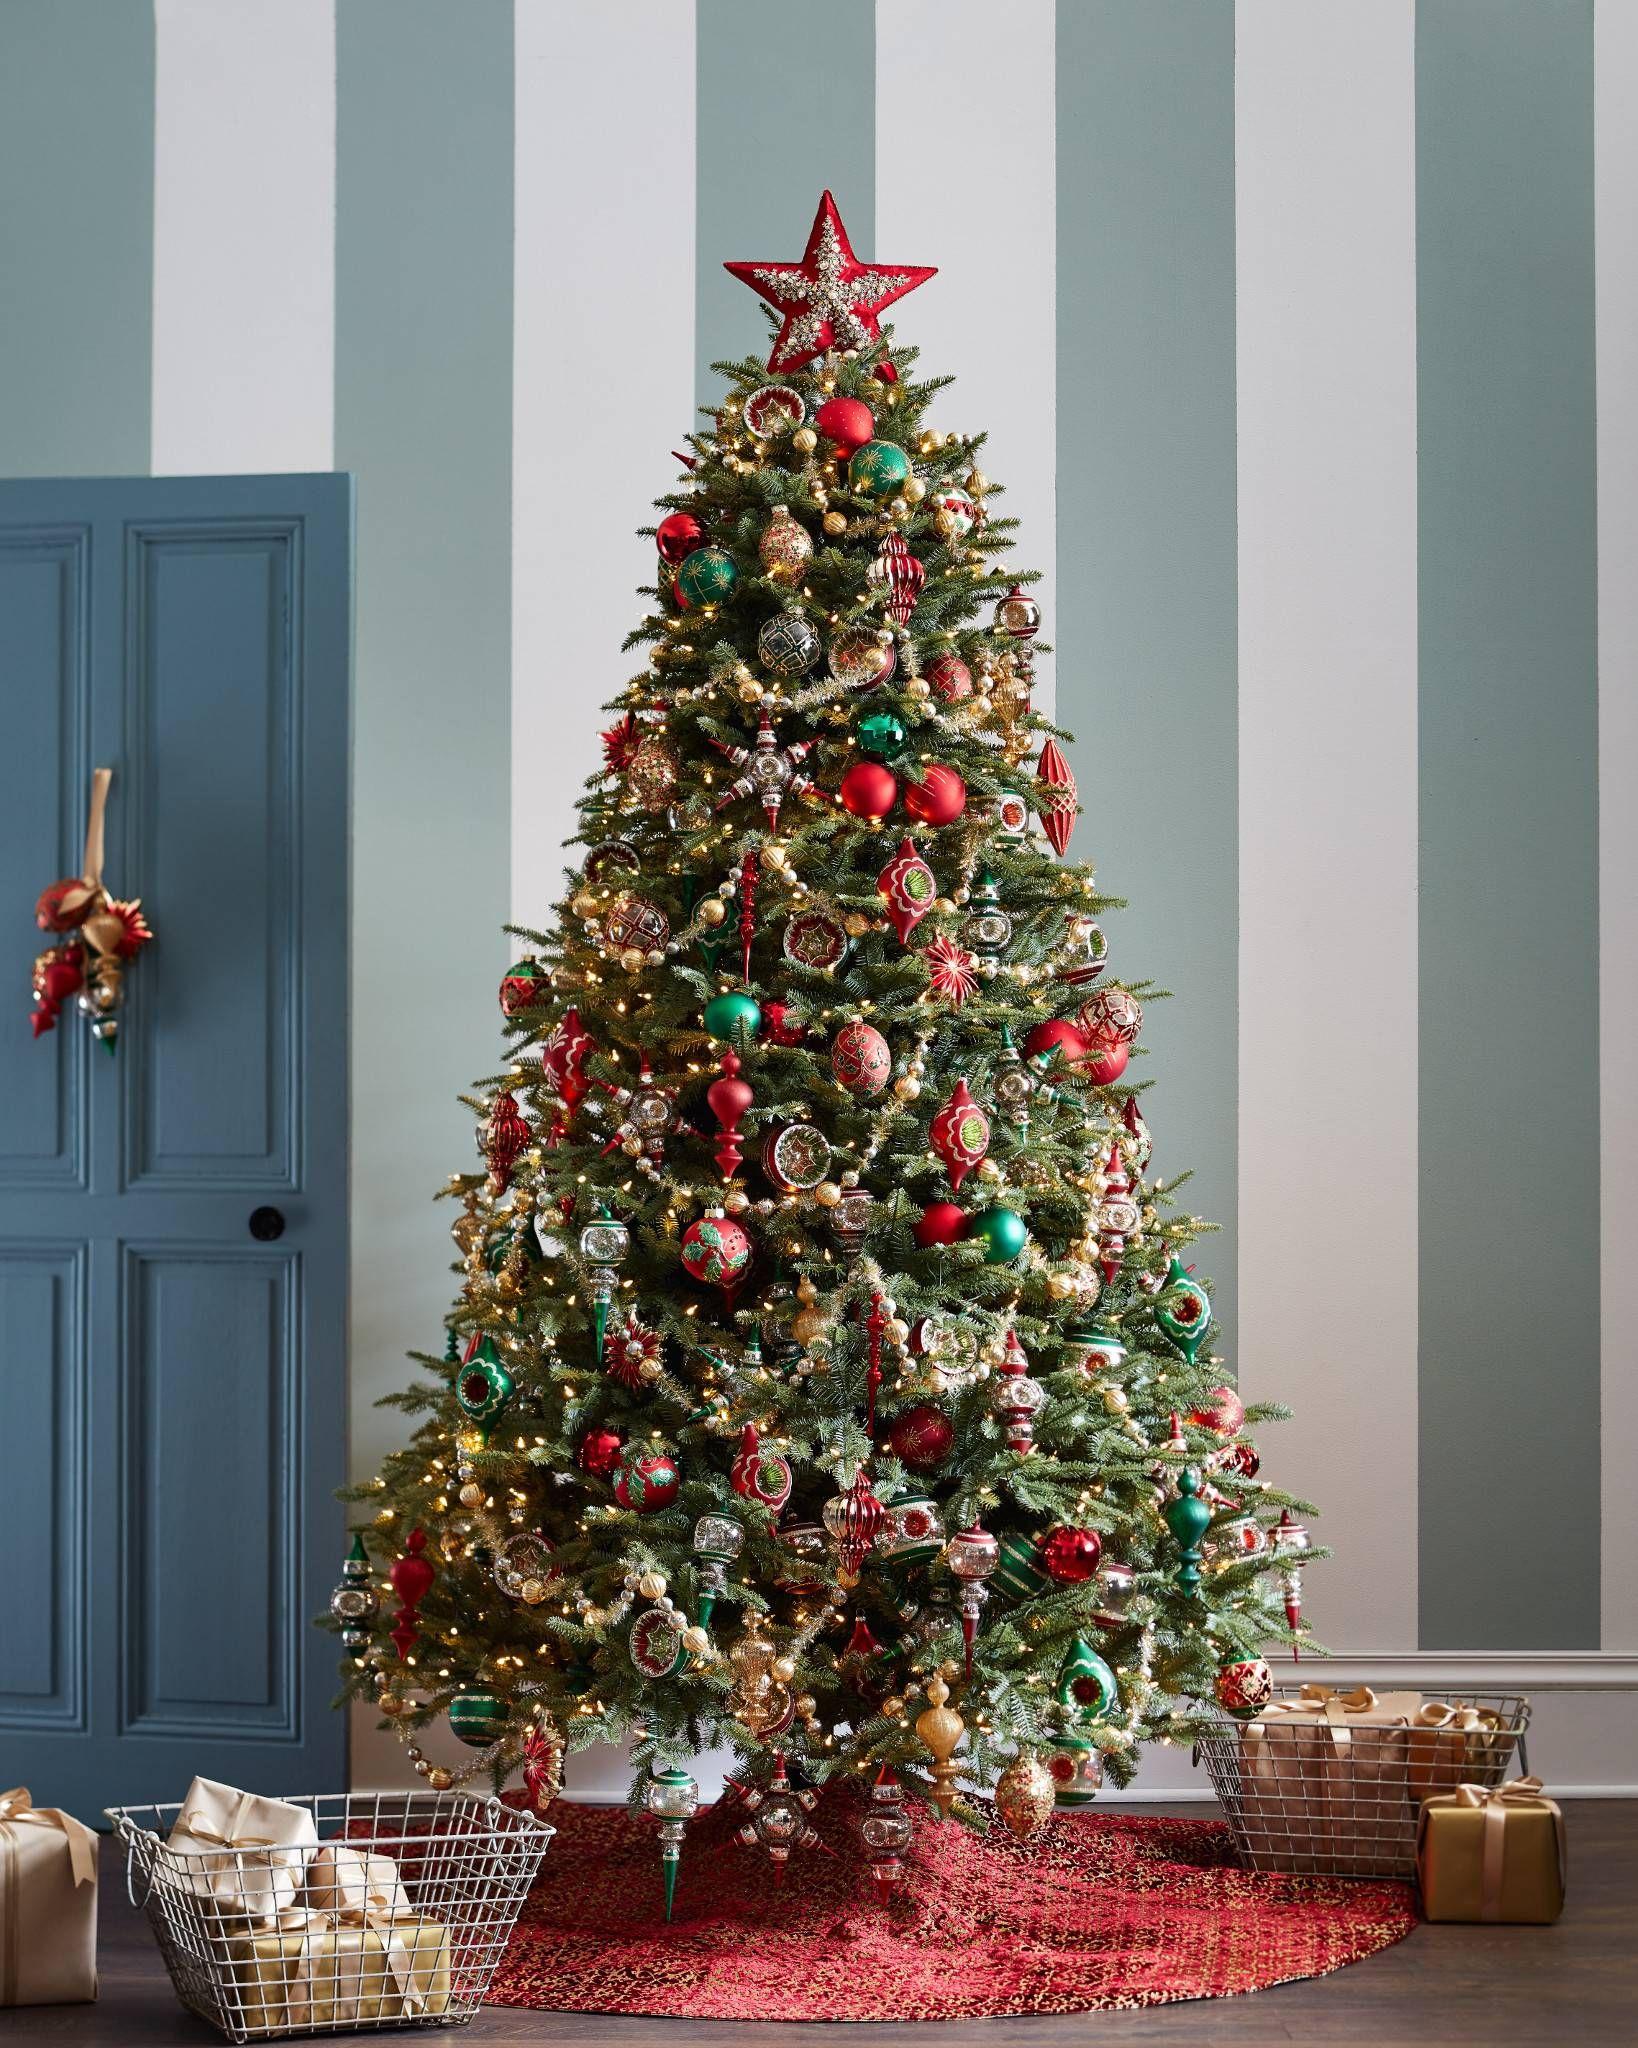 Bh Fraser Fir Artificial Christmas Trees Balsam Hill Christmas Tree Garland Gold Christmas Tree Cool Christmas Trees